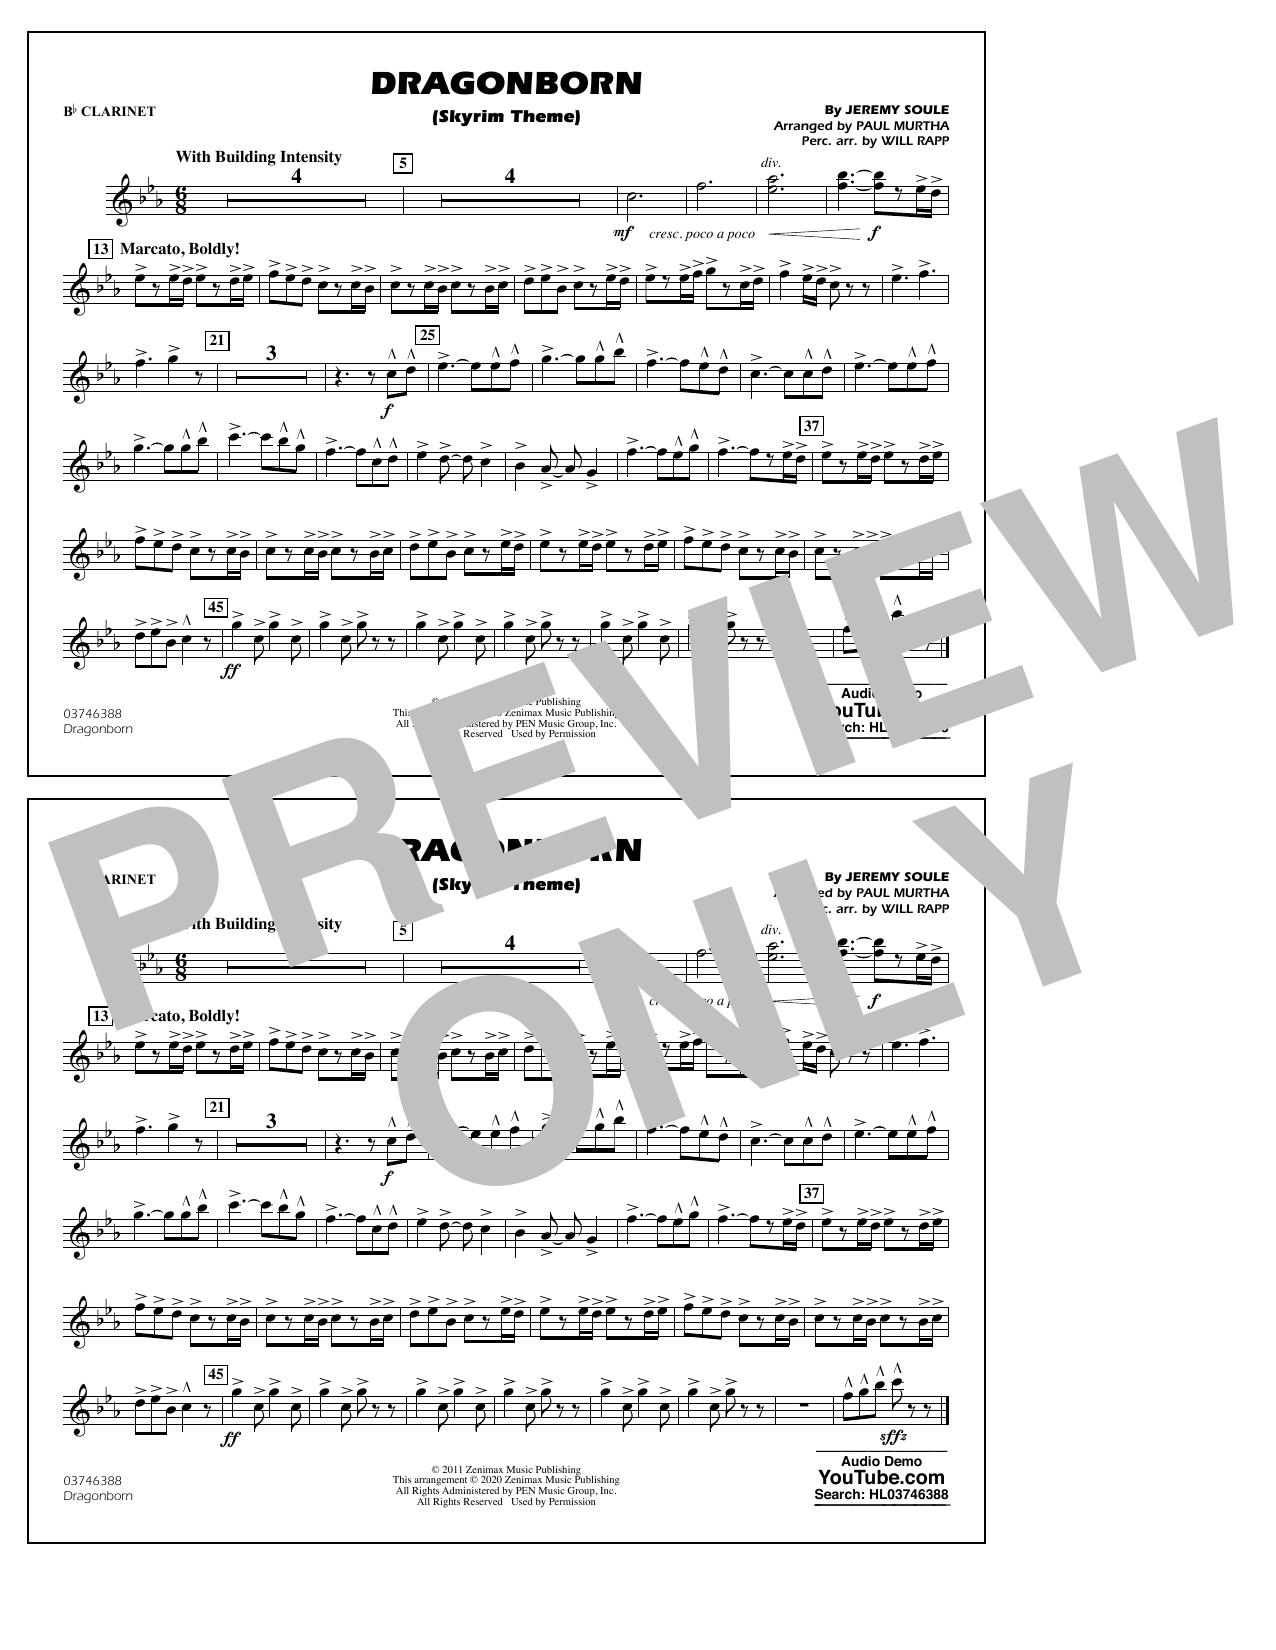 Dragonborn (Skyrim Theme) (arr. Will Rapp & Paul Murtha) - Bb Clarinet Sheet Music